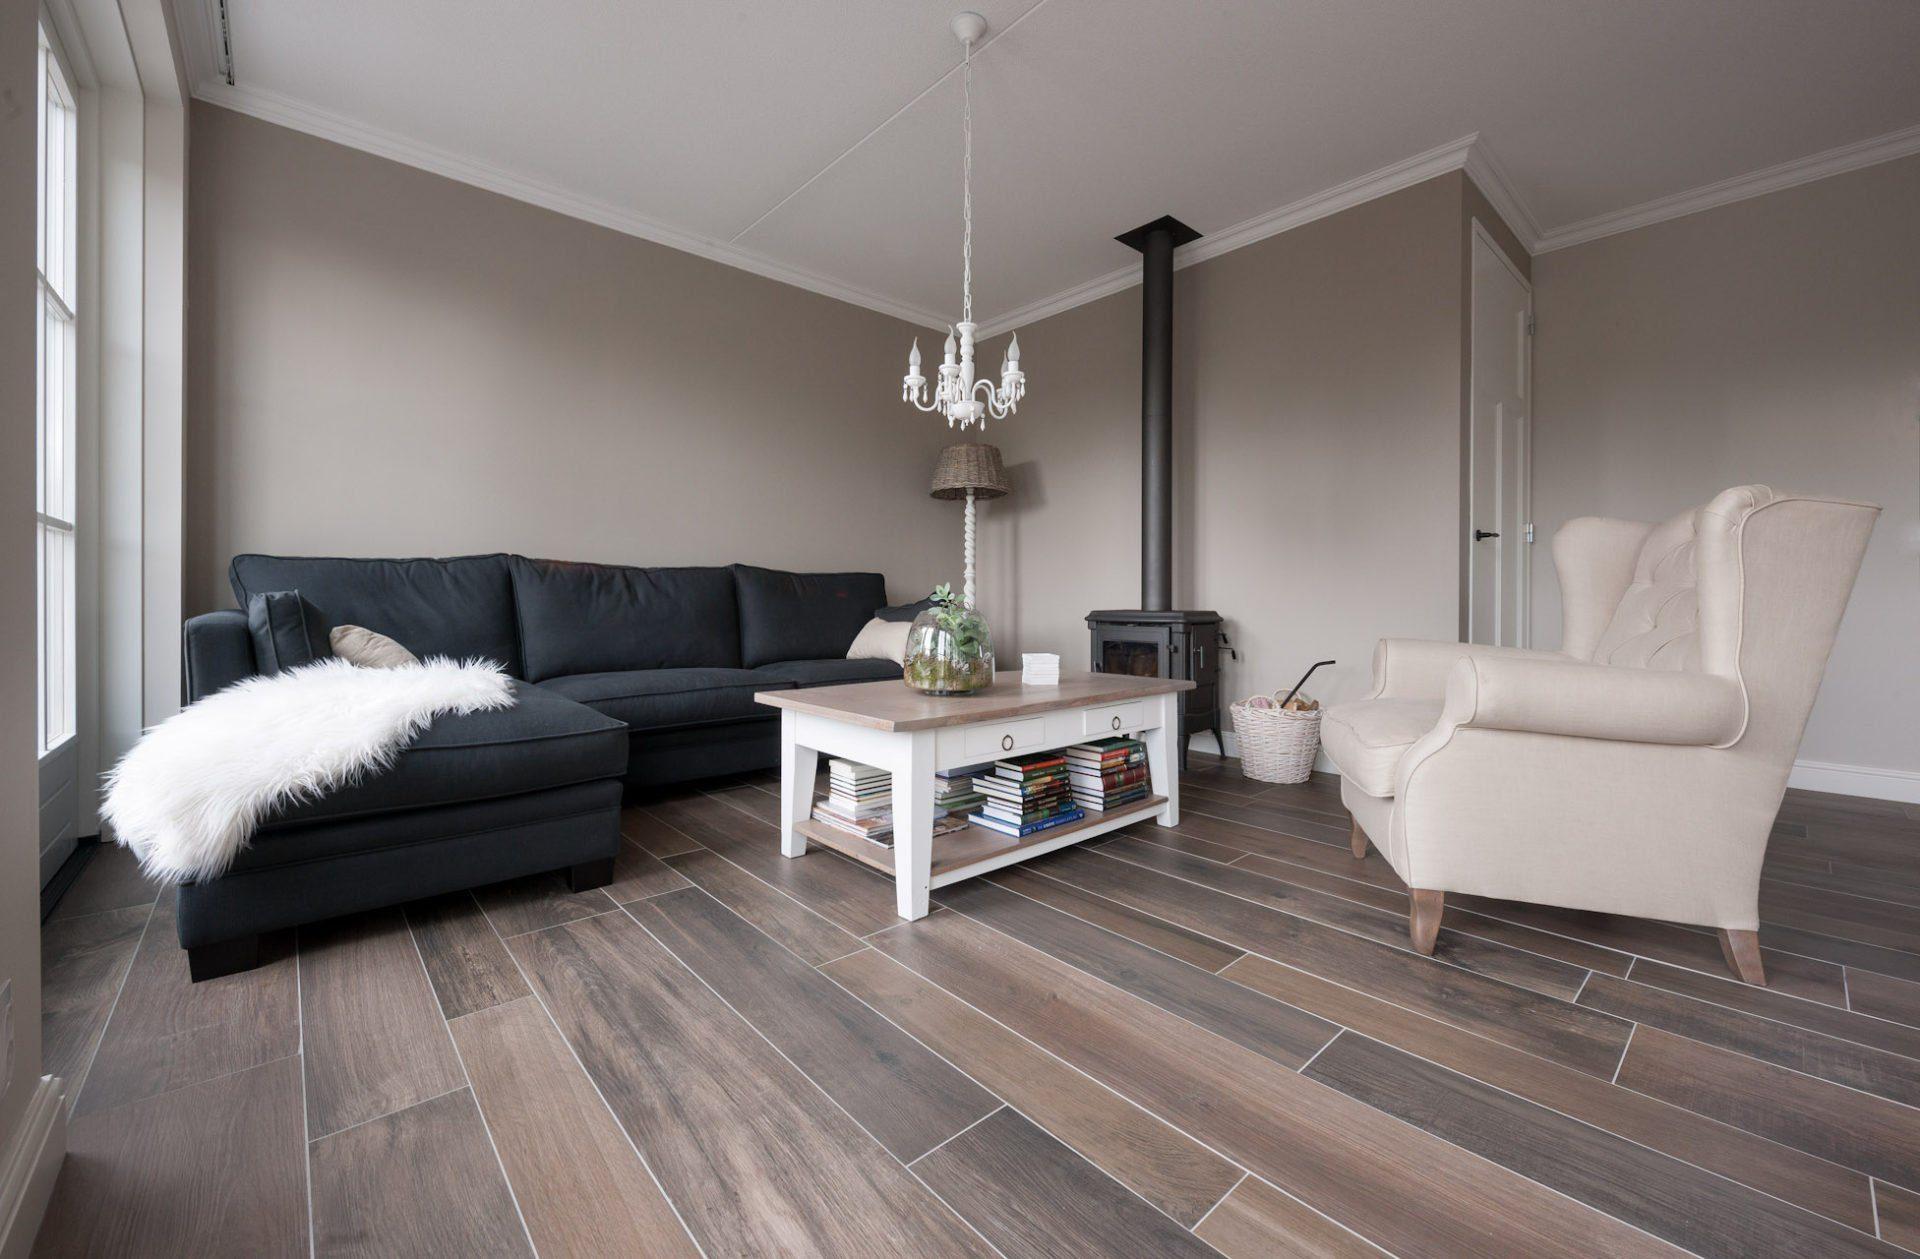 Houtlook tegels in woonkamer zwart wit geblokte vloer in hal - Woonkamer in zwart ...